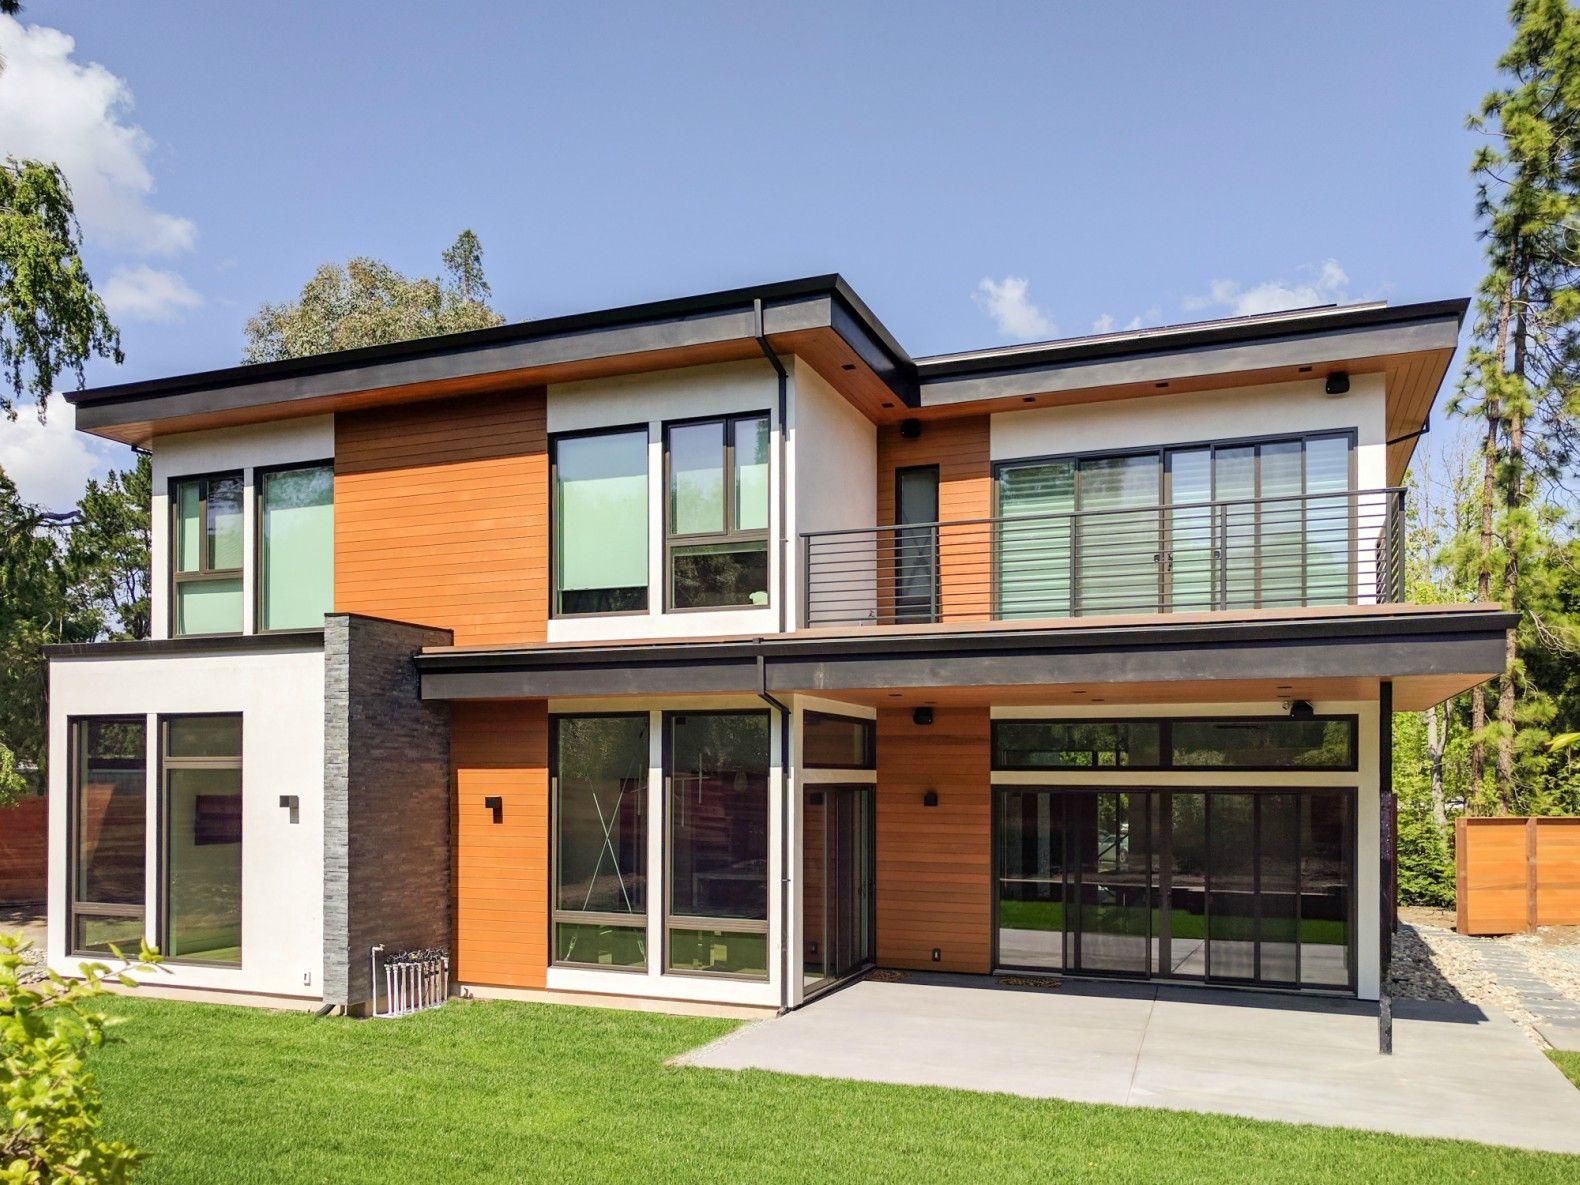 Mark Z. Jacobson, Net Zero Home, BONE Structure, Net Zero Home Design